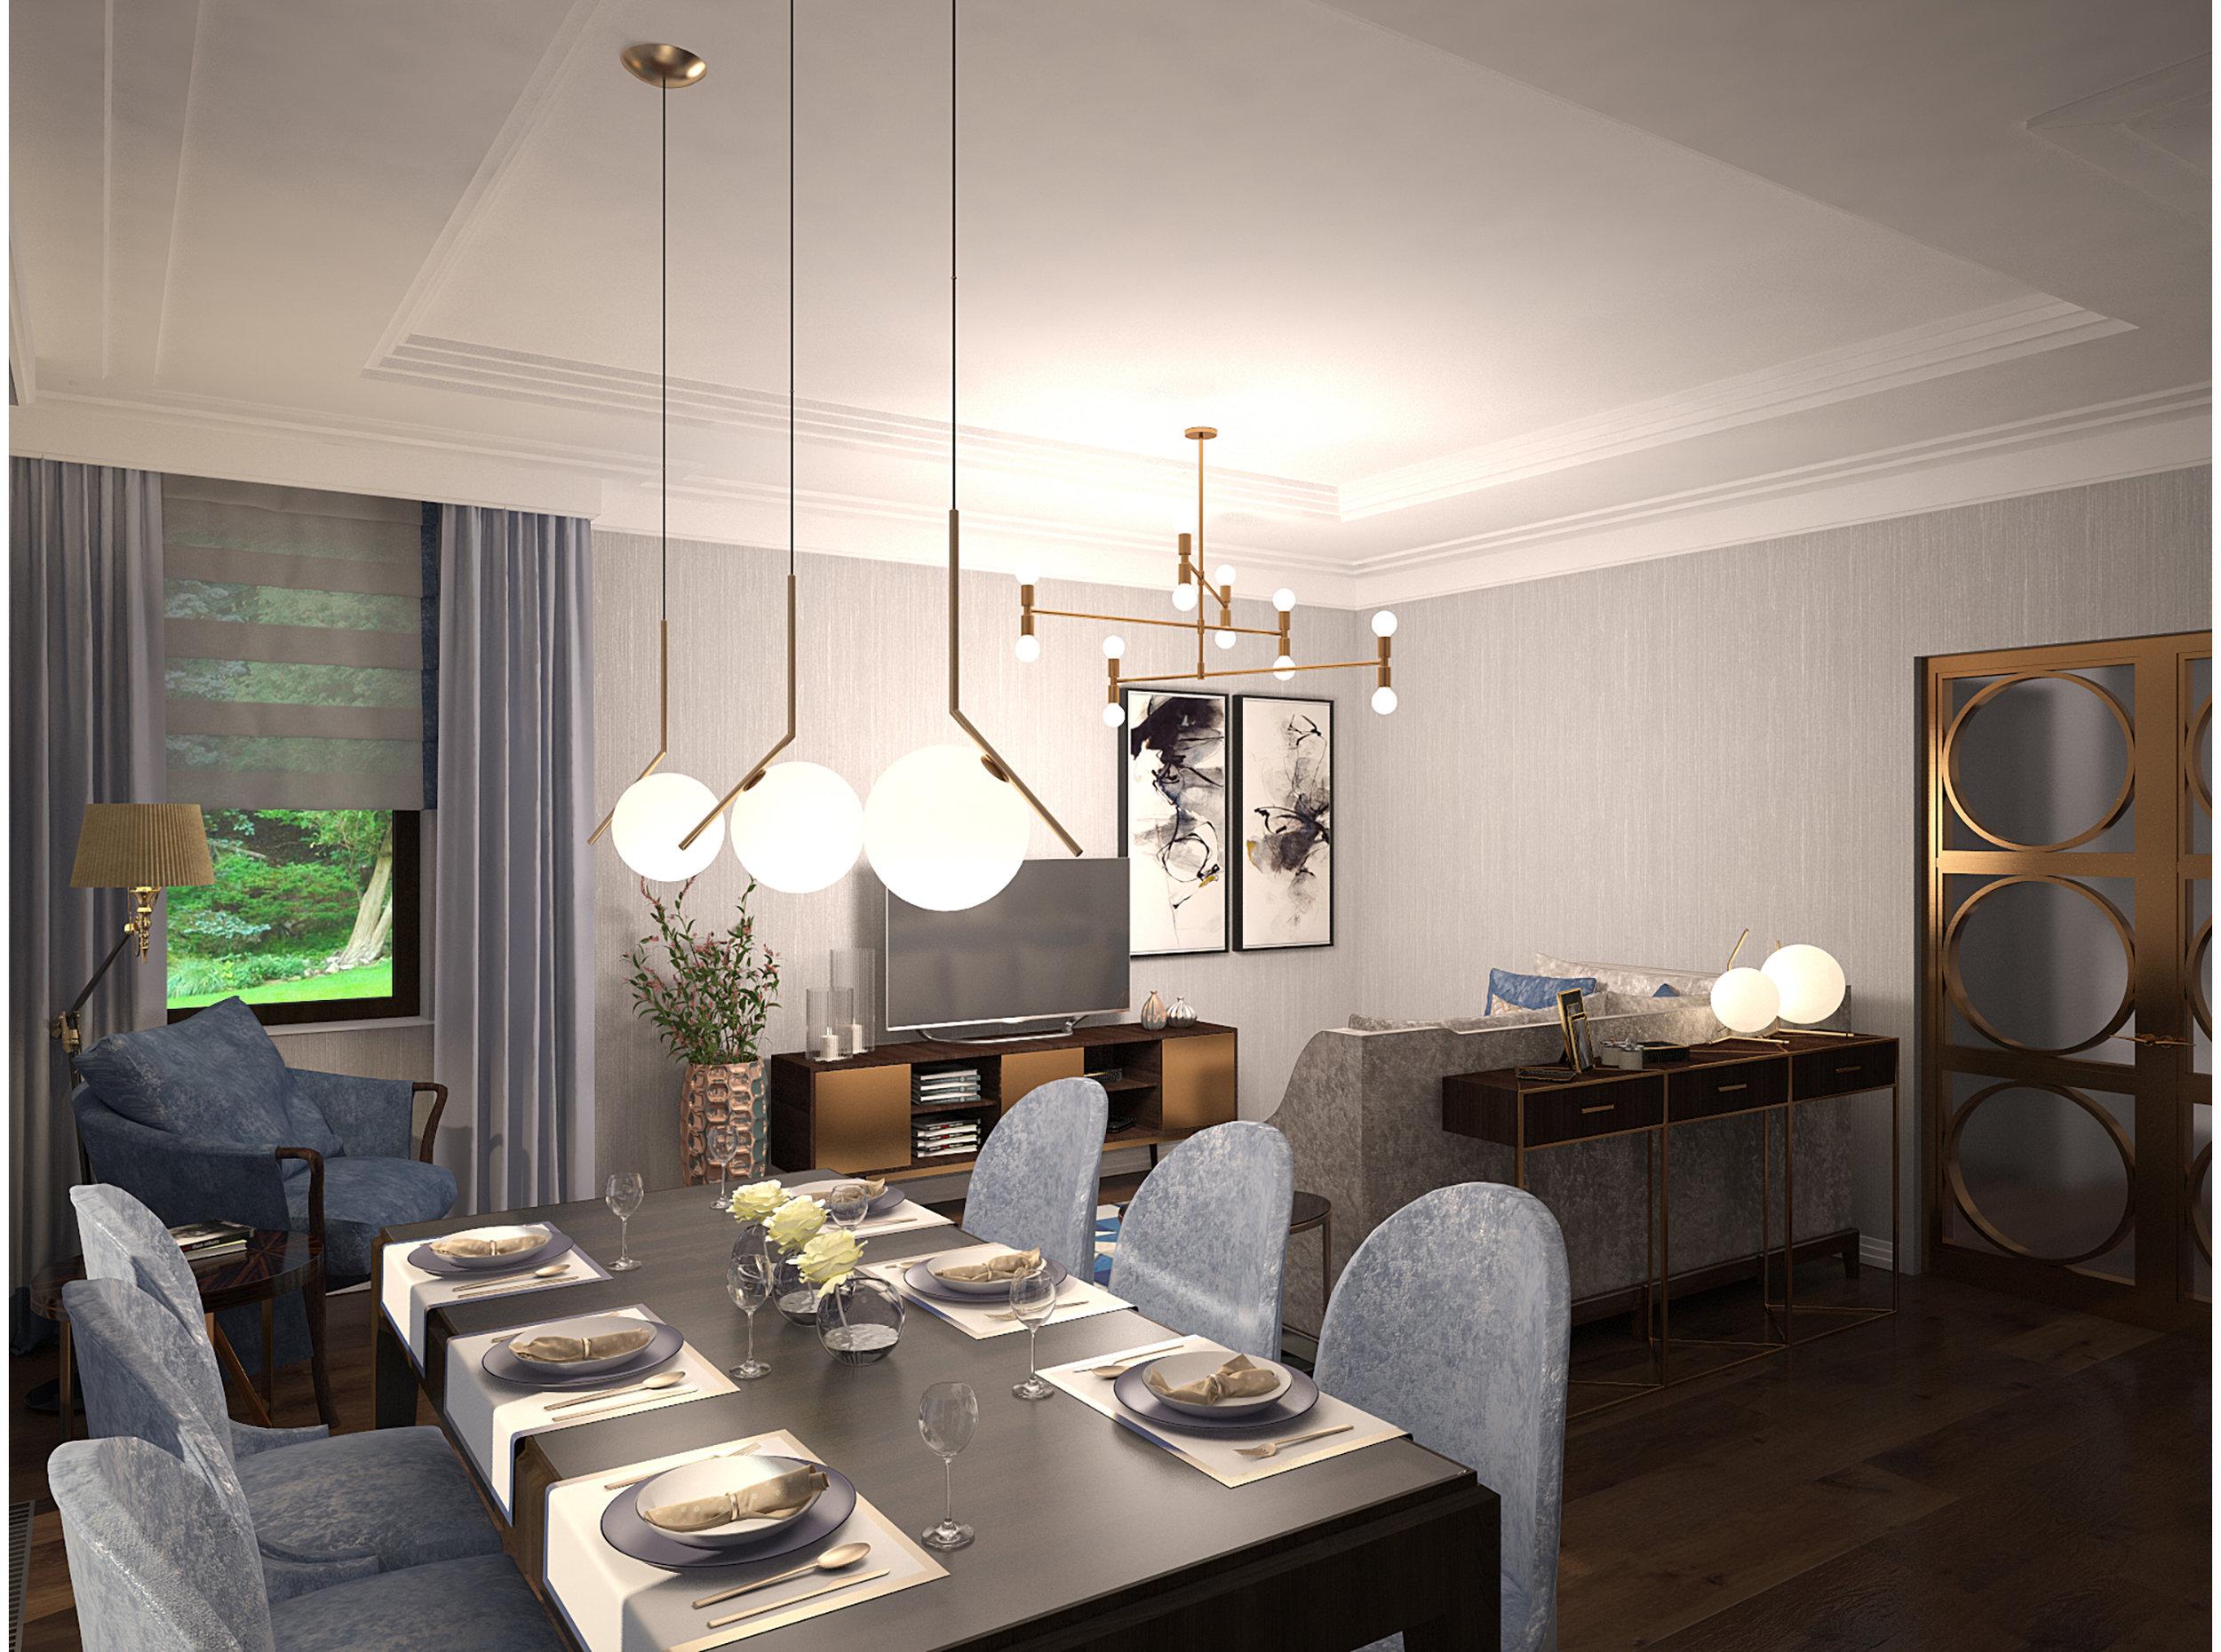 Copy of Dining area art deco style